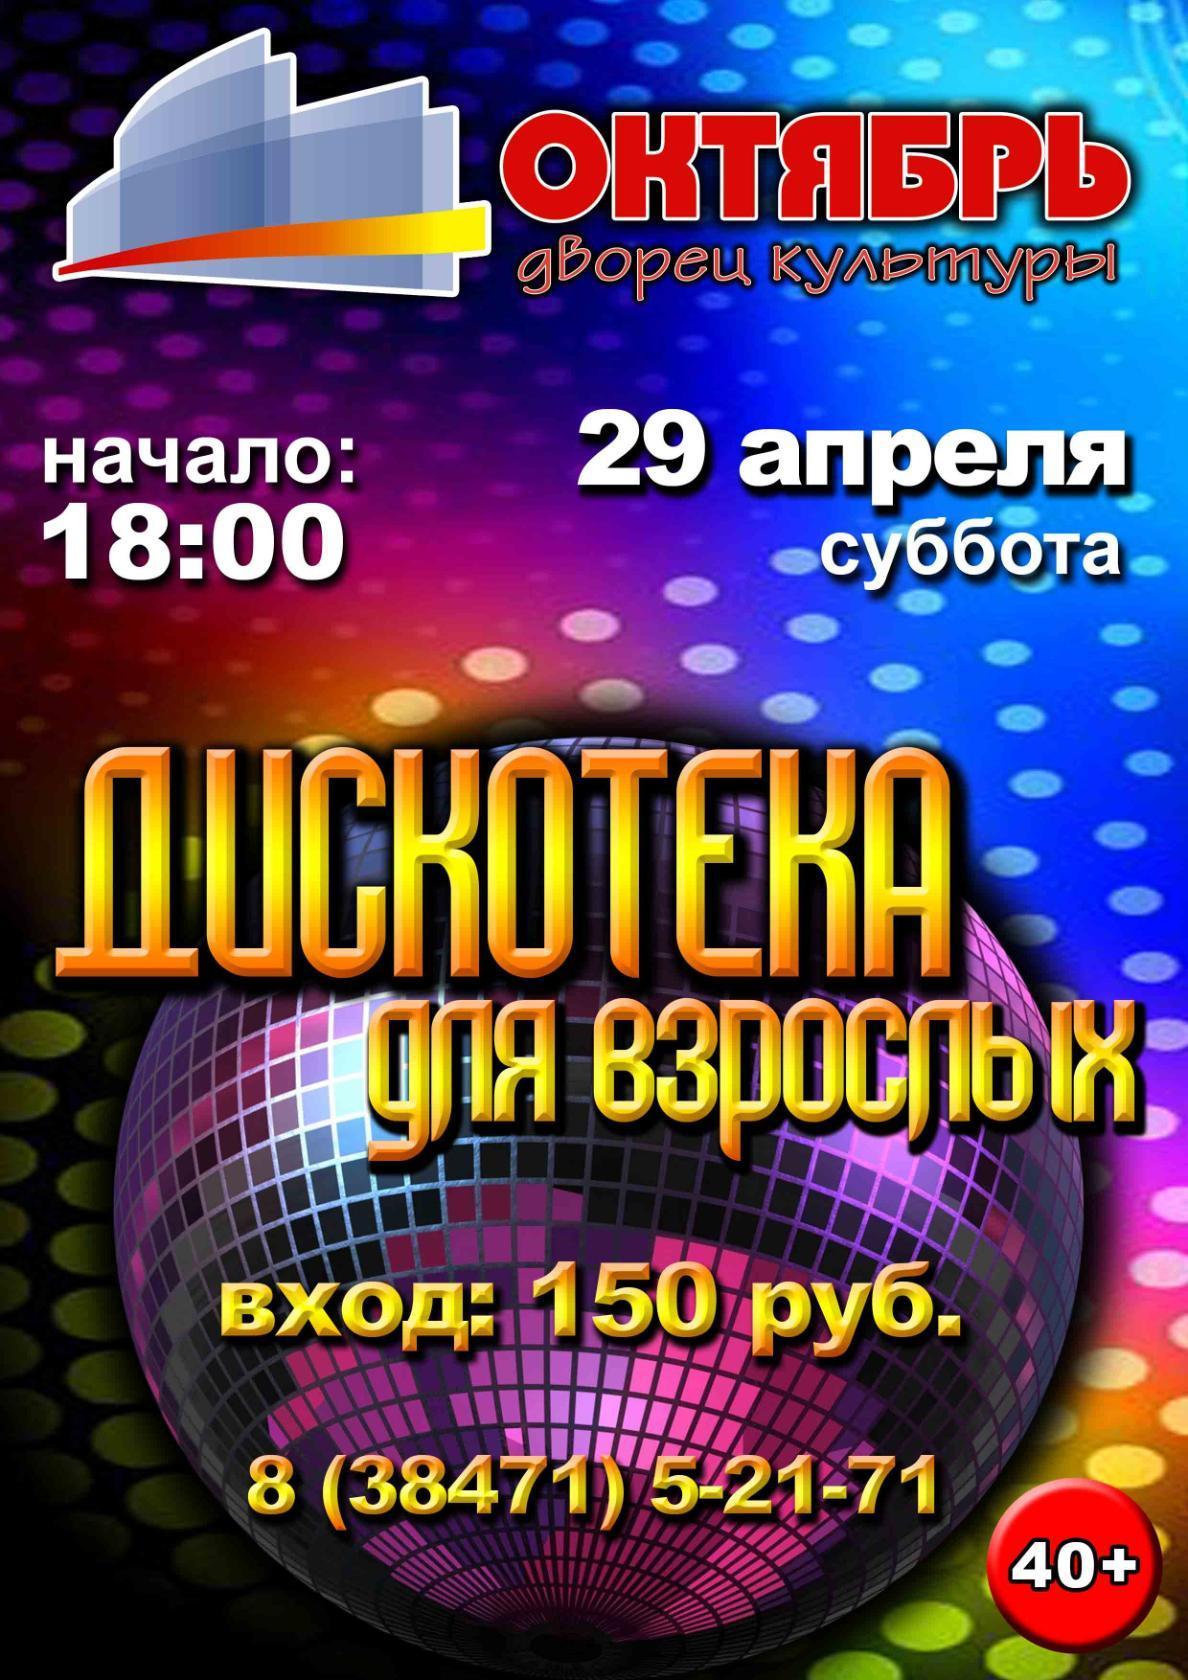 реклама  осинники  дкоктябрь  афиша  29аперля 181fac4aec8